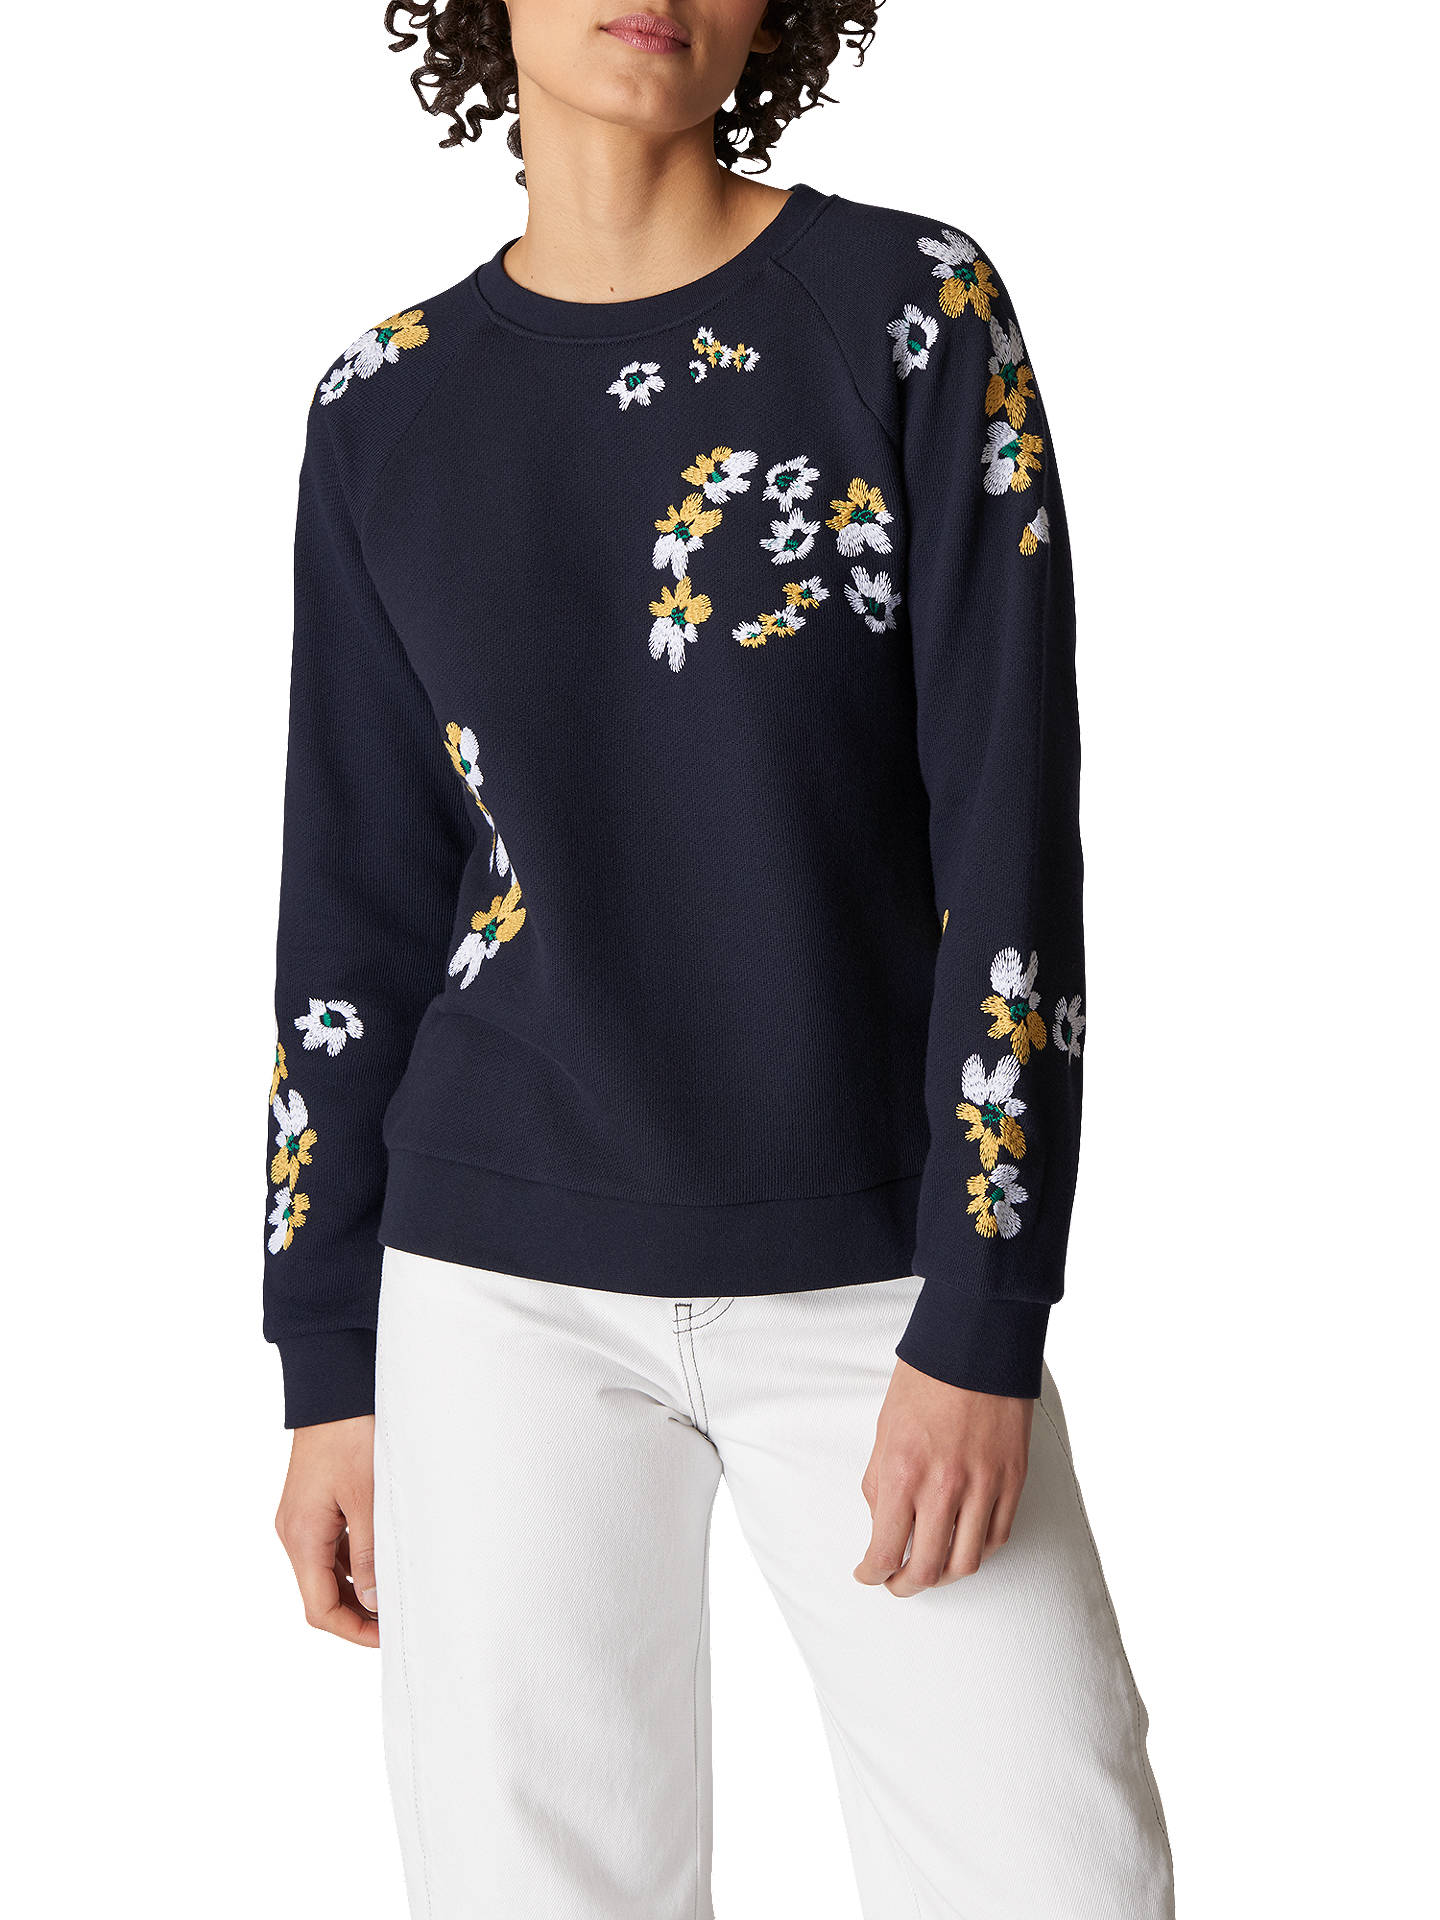 6e23ce6a68 Whistles Lottie Floral Sweatshirt, Multi at John Lewis & Partners